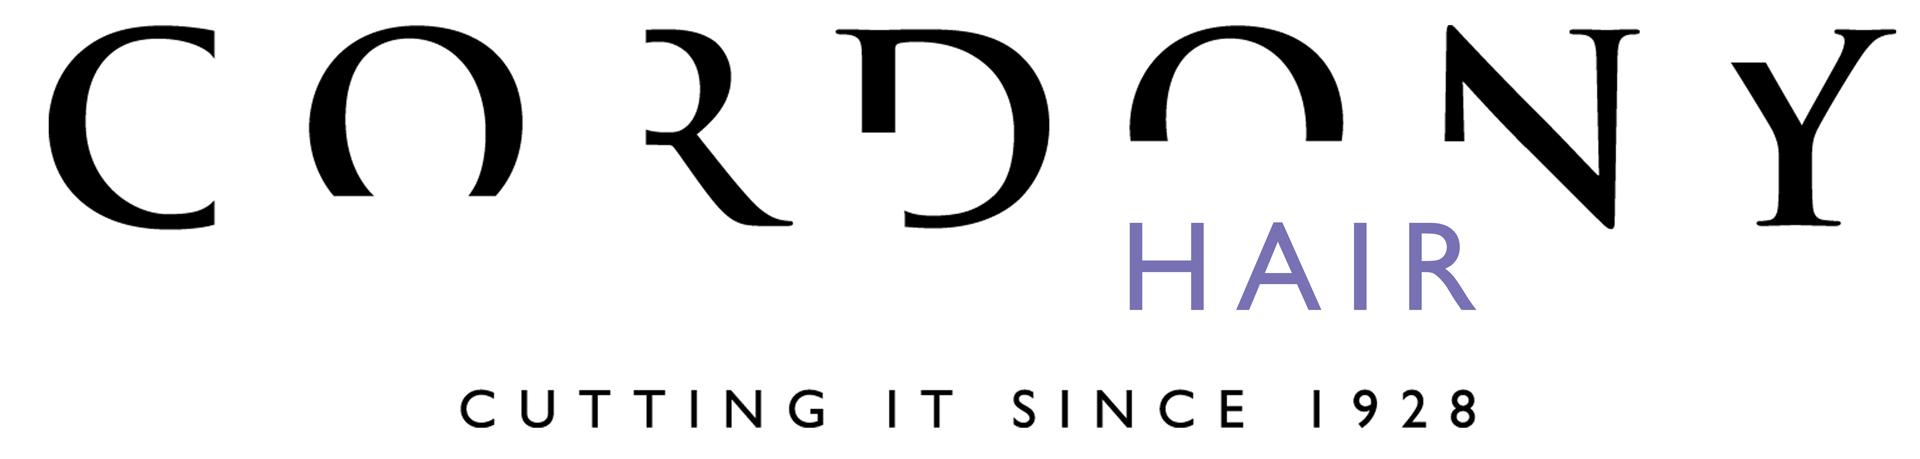 cordonyhair logo 1920